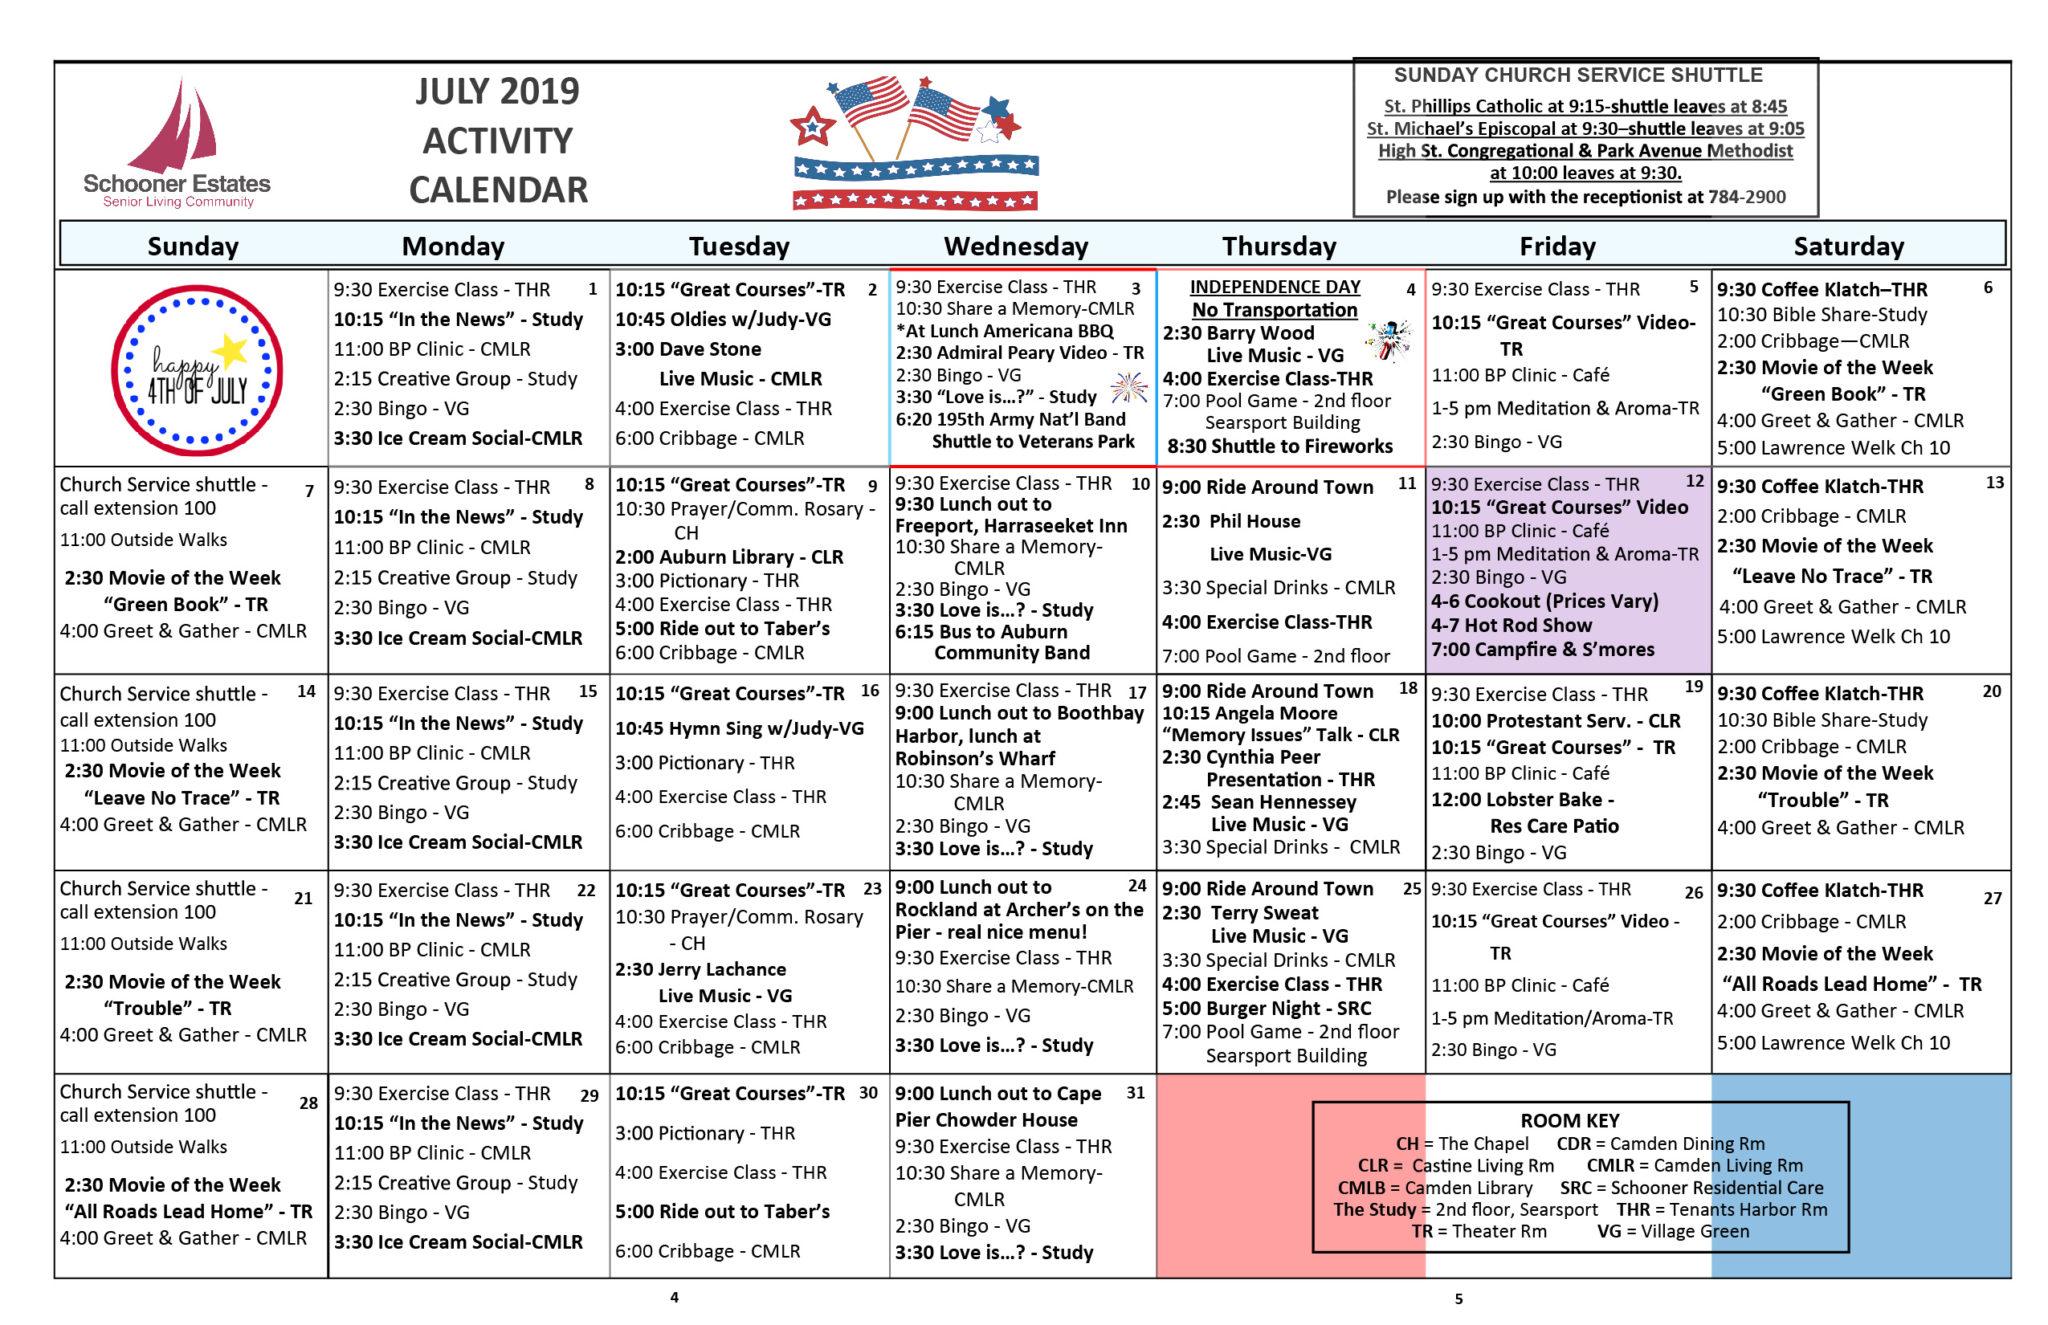 July 2019 Schooner Estates Activity Calendars For Assisted Living Activity Calendars